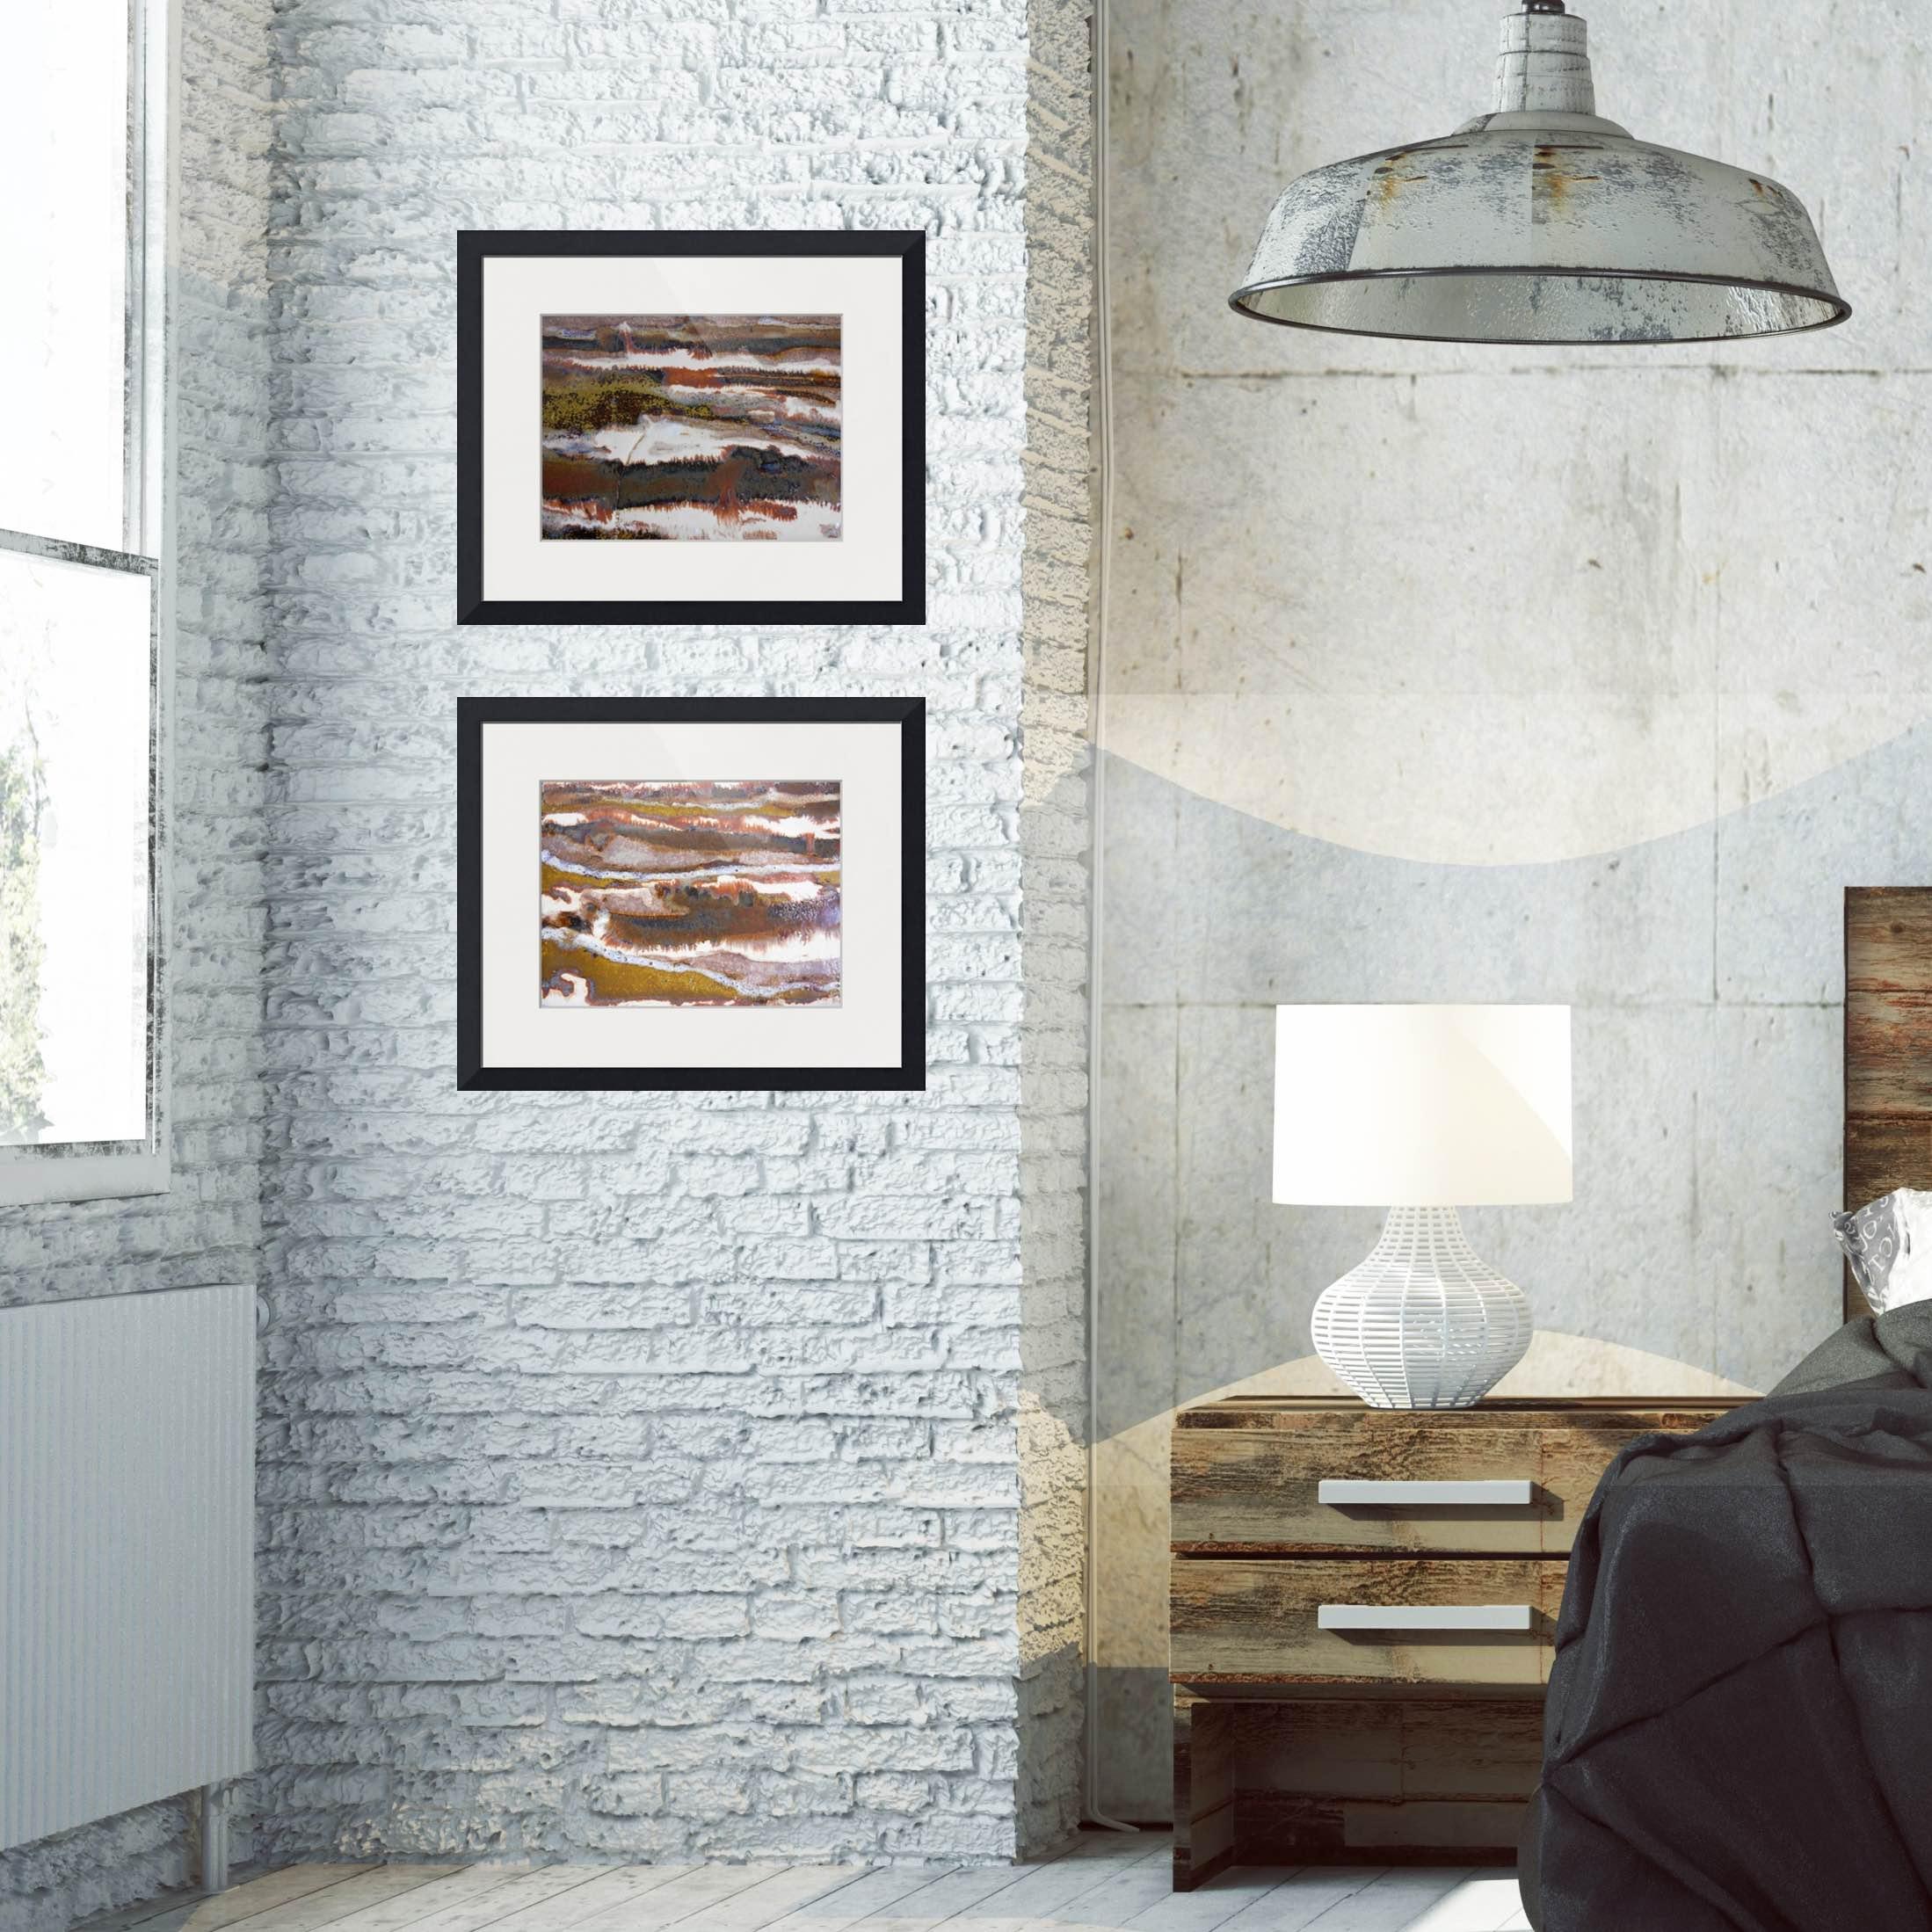 #21 & 22 set of rectangular framed prints